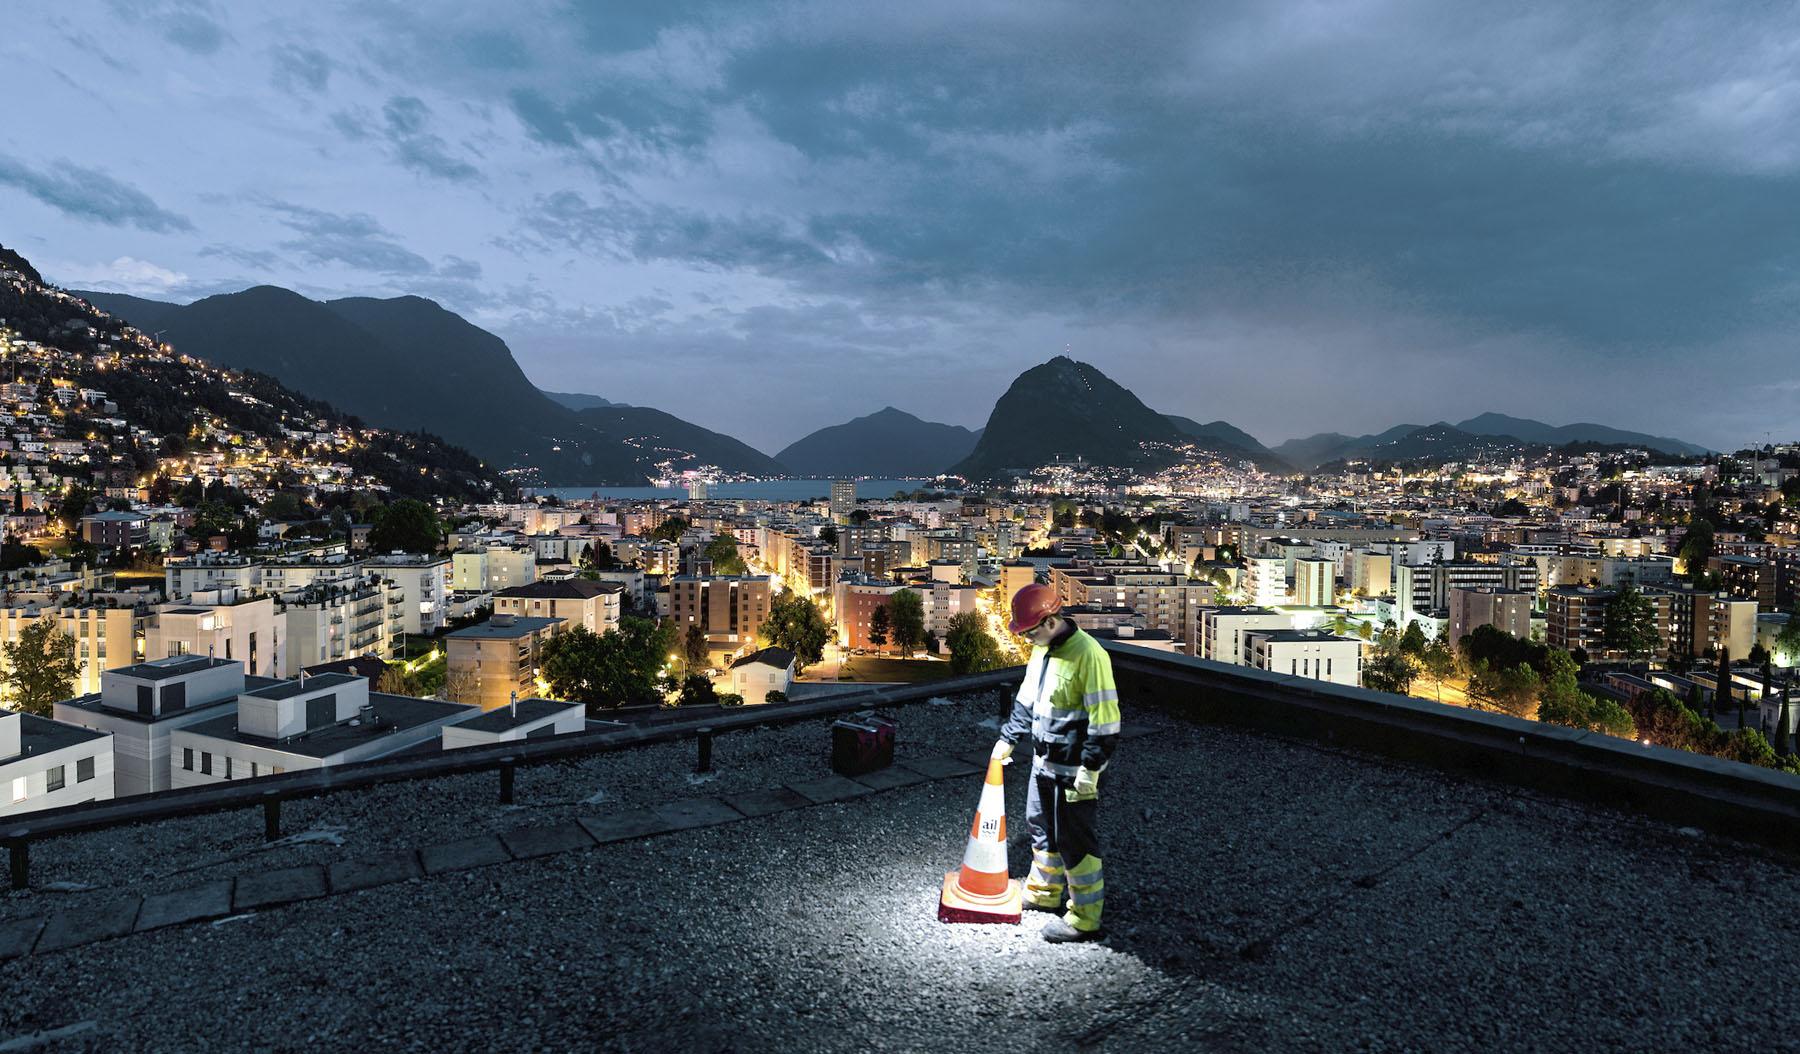 Corporate and portrait photographer in Lugano, Switzerland